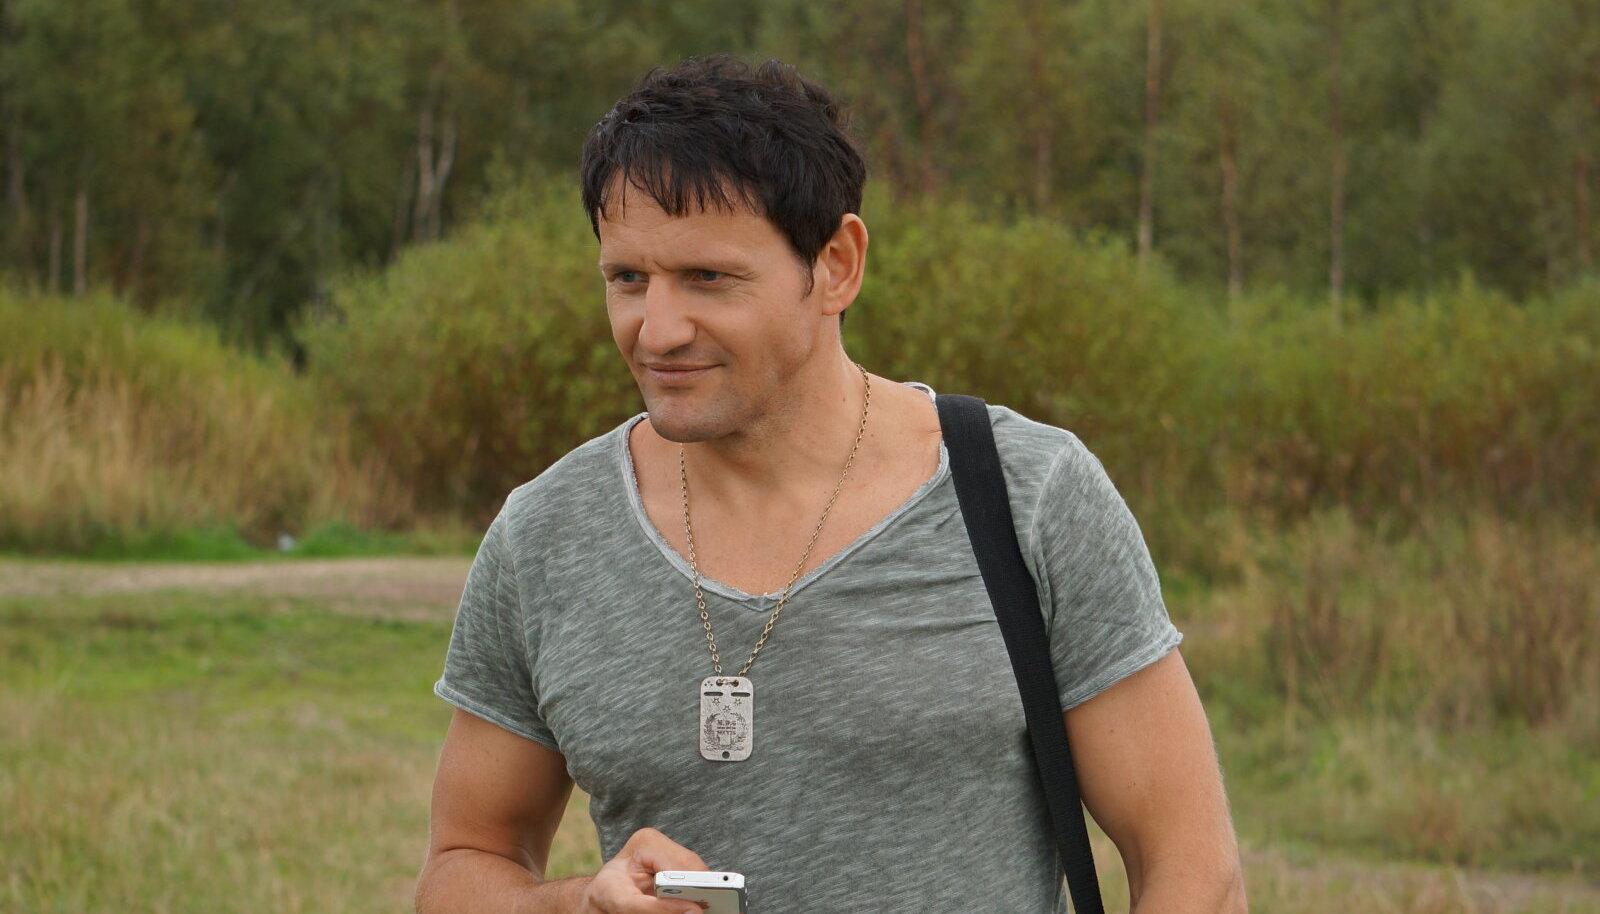 Peeter Karask